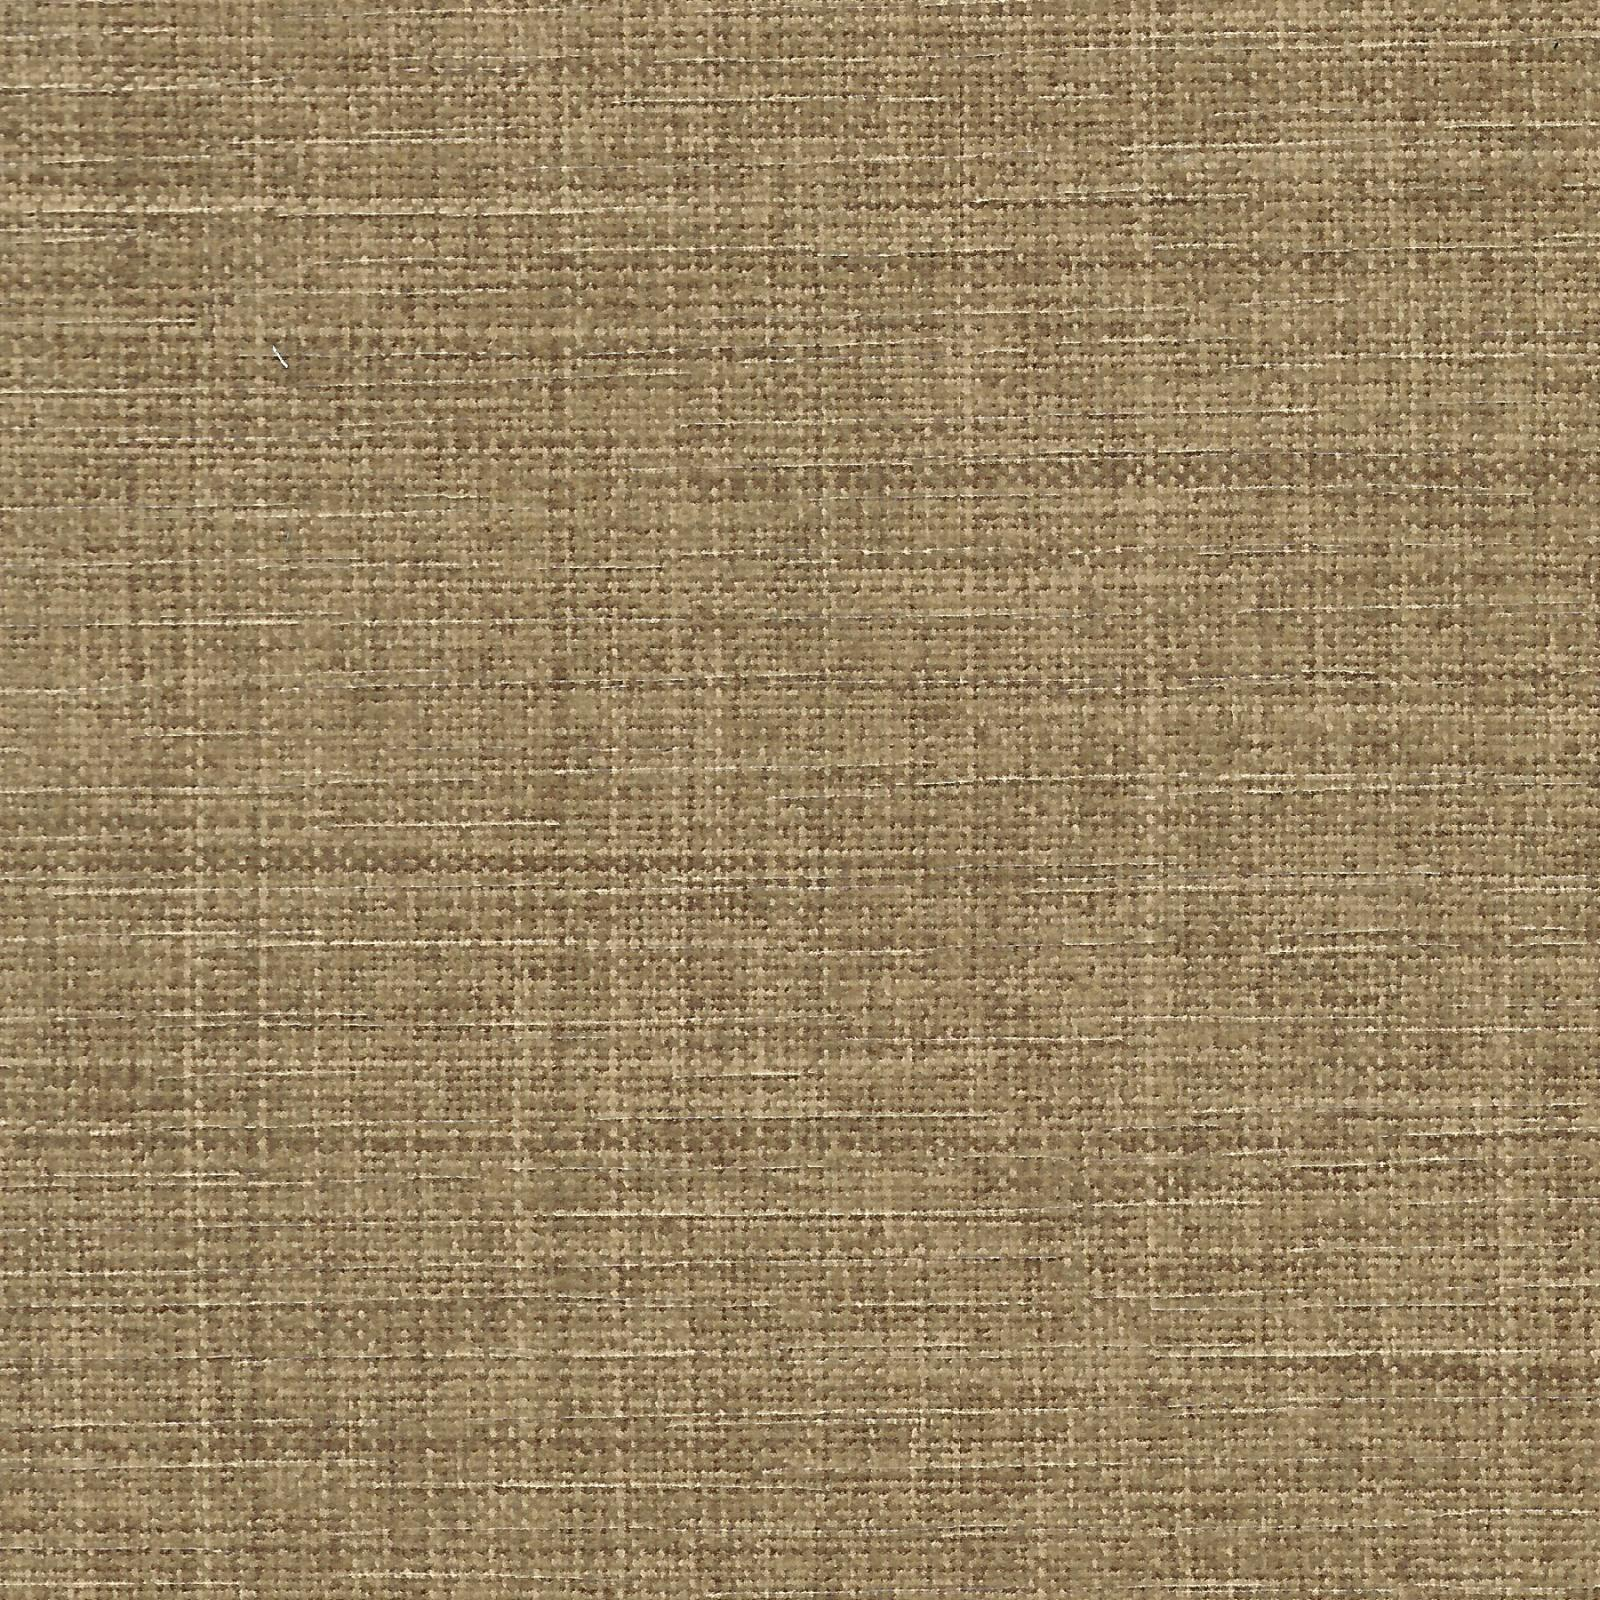 Linen Texture : Designer Texture/Finish